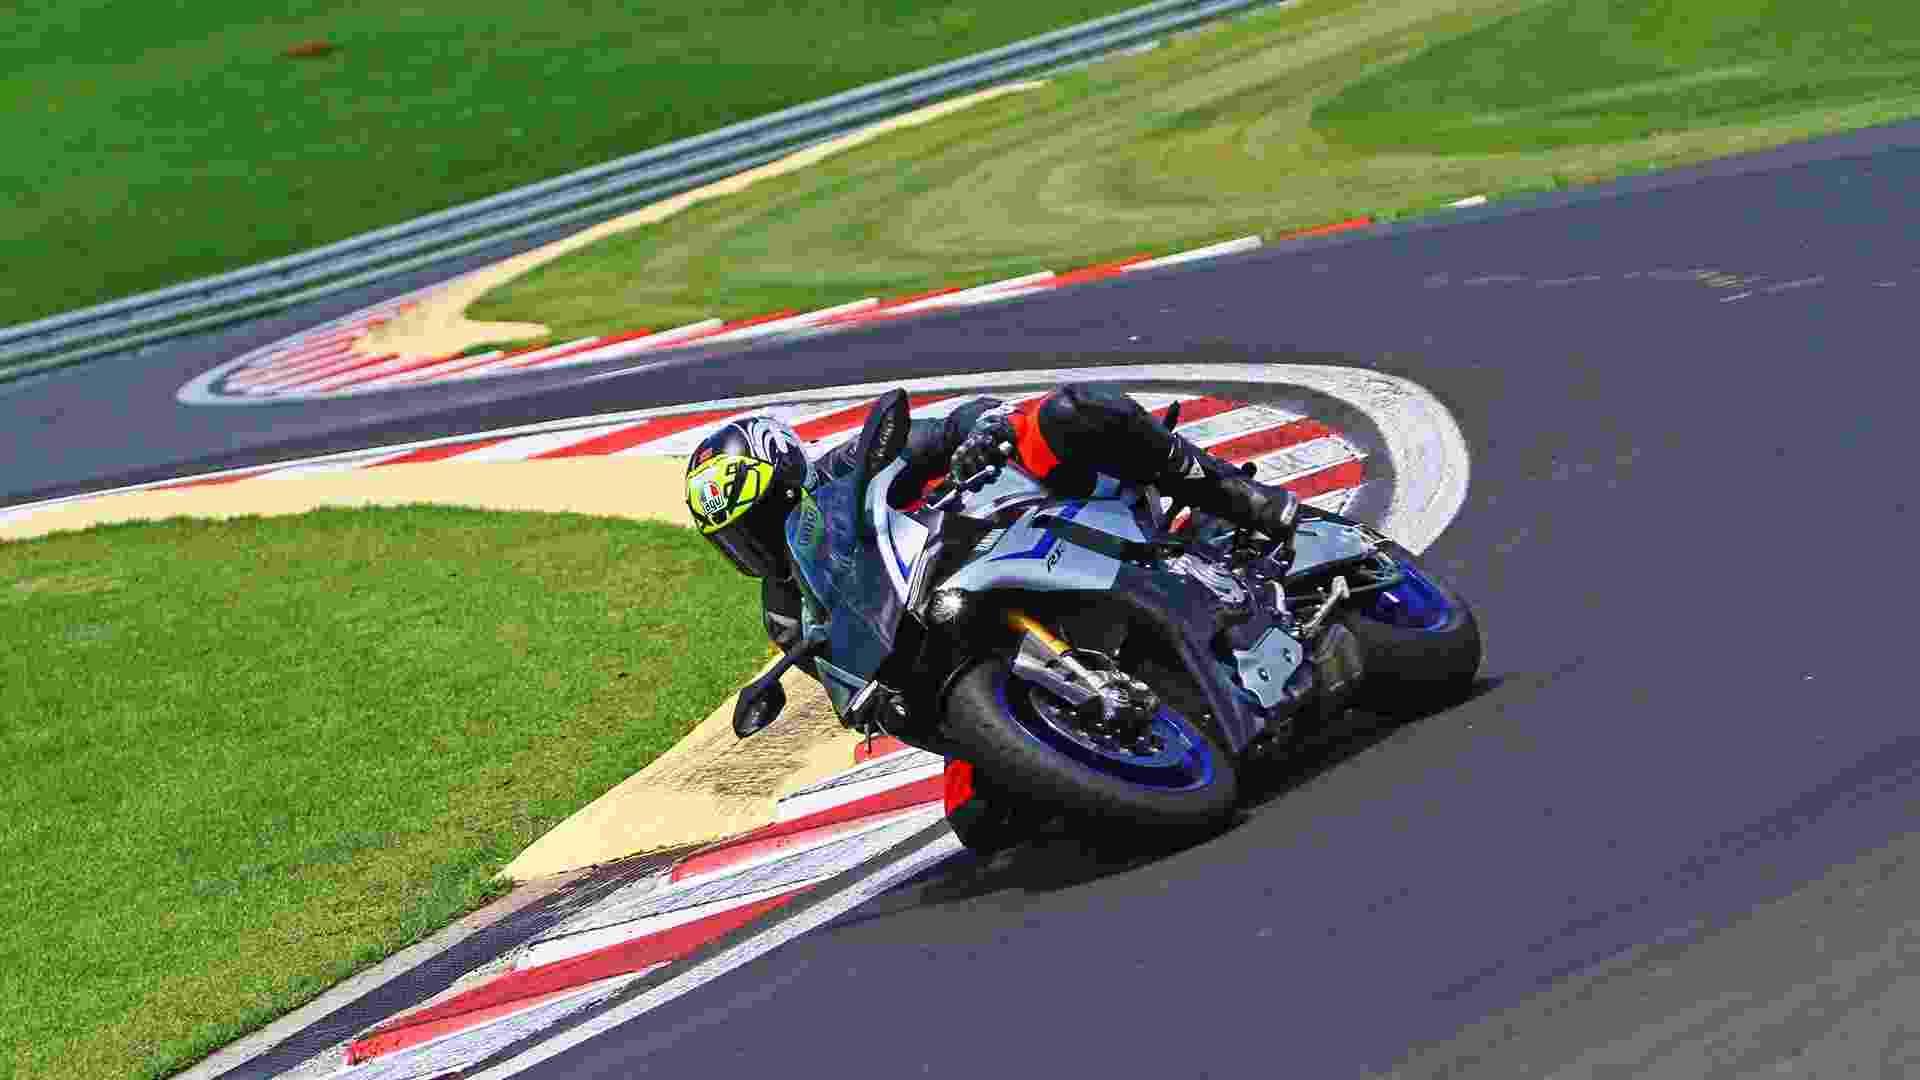 Yamaha YZF-R1M 2016 - Mario Villaescusa/Infomoto